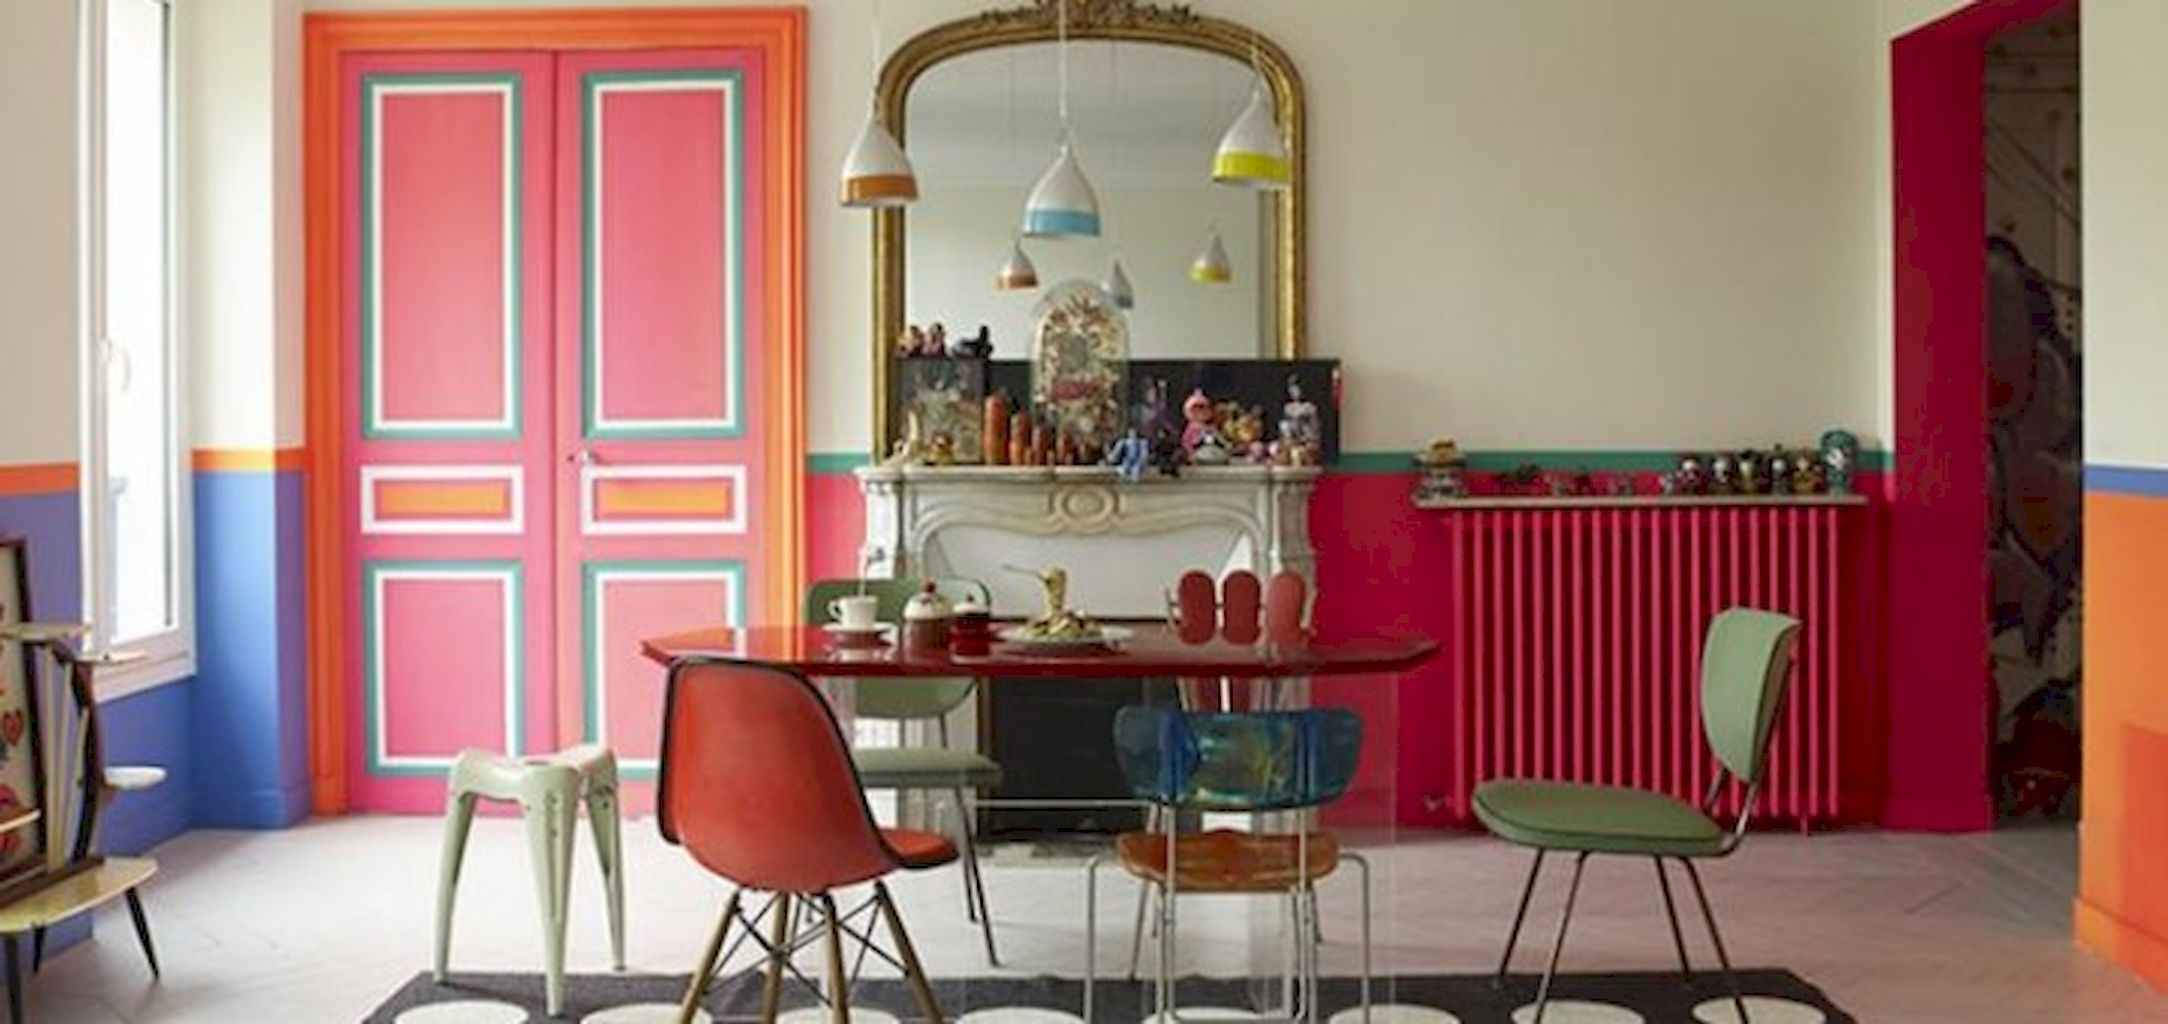 80 Stunning Apartment Dining Room Decor Ideas (24)